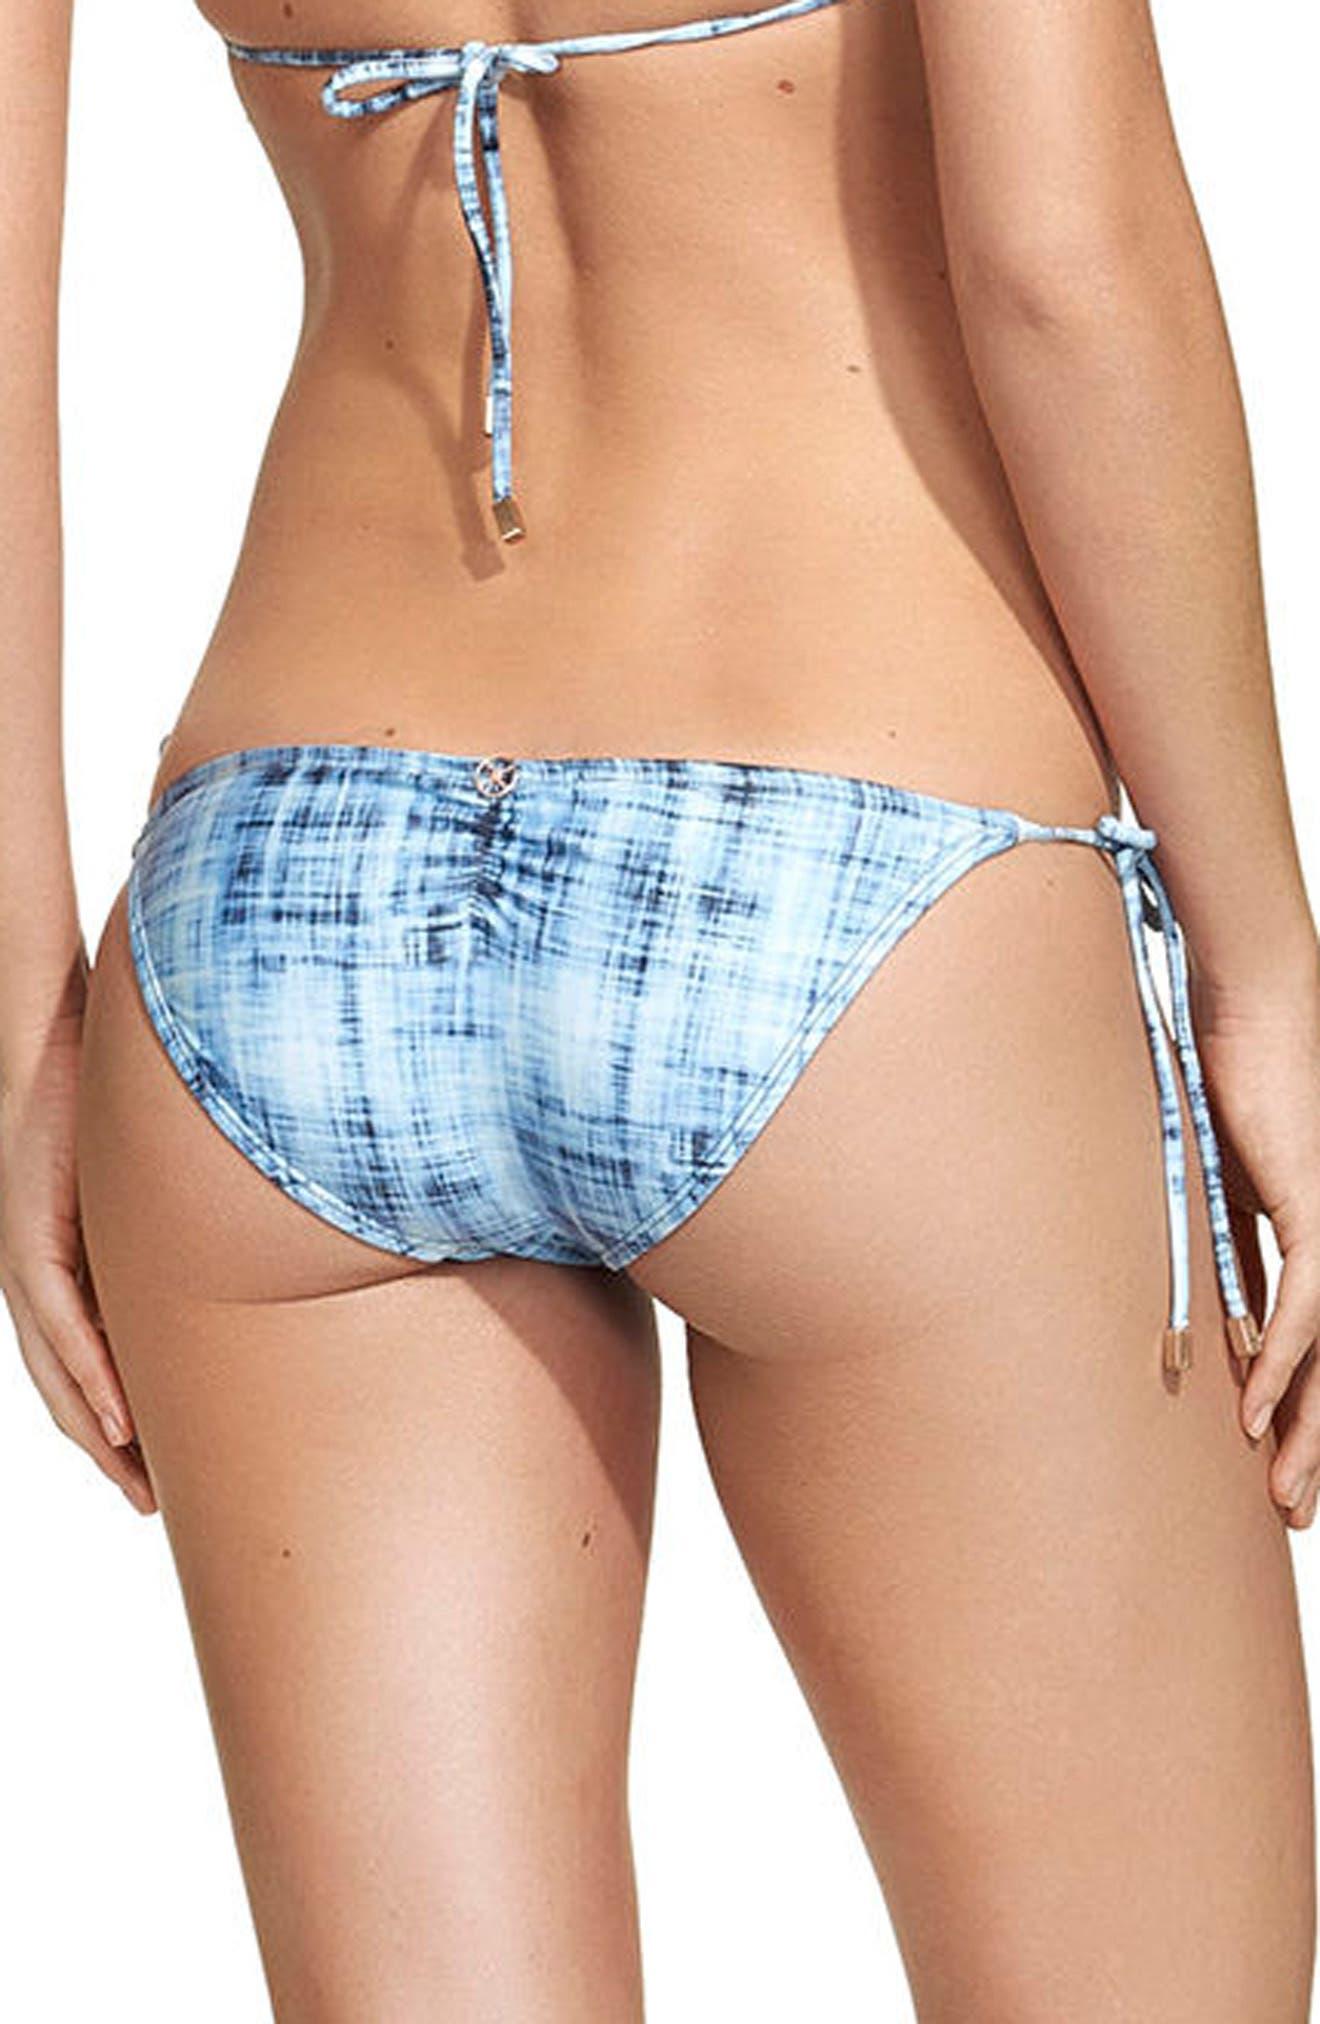 Rustic Ripple Side Tie Bikini Bottoms,                             Main thumbnail 1, color,                             Blue